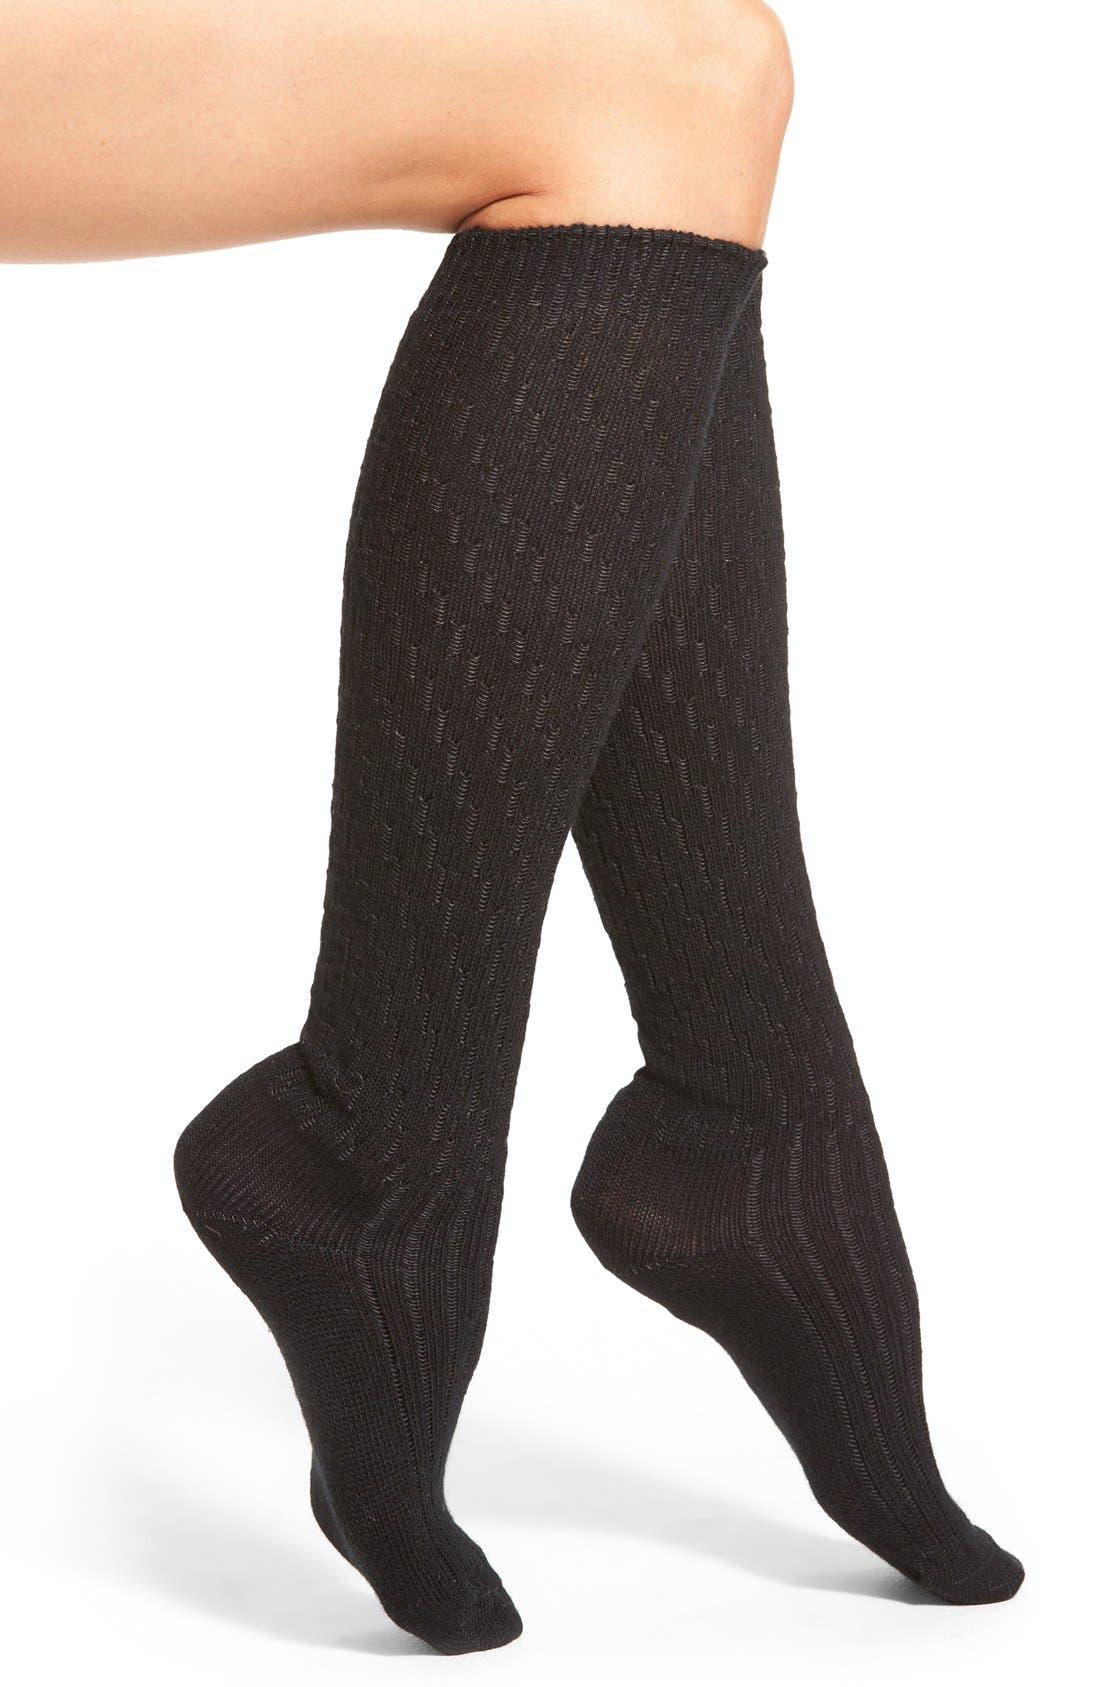 Alternate Image 1 Selected - Wigwam 'Retro Lilly' Merino Wool Blend Knee High Socks